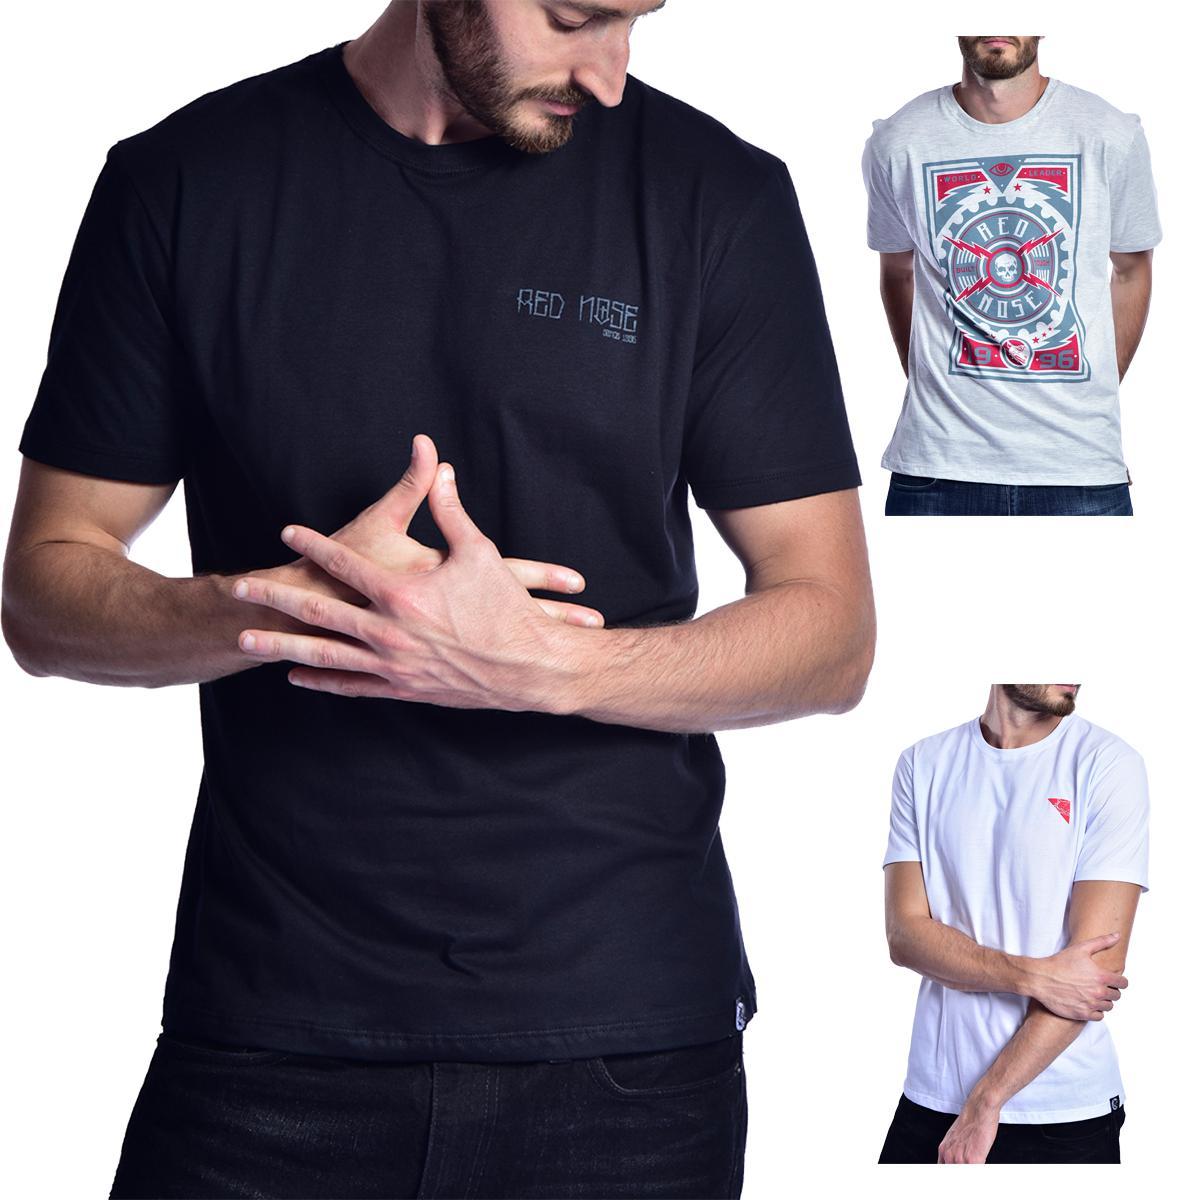 KIT 3 Camisetas Red Nose  - Preto e Cinza Escuro e Branco P